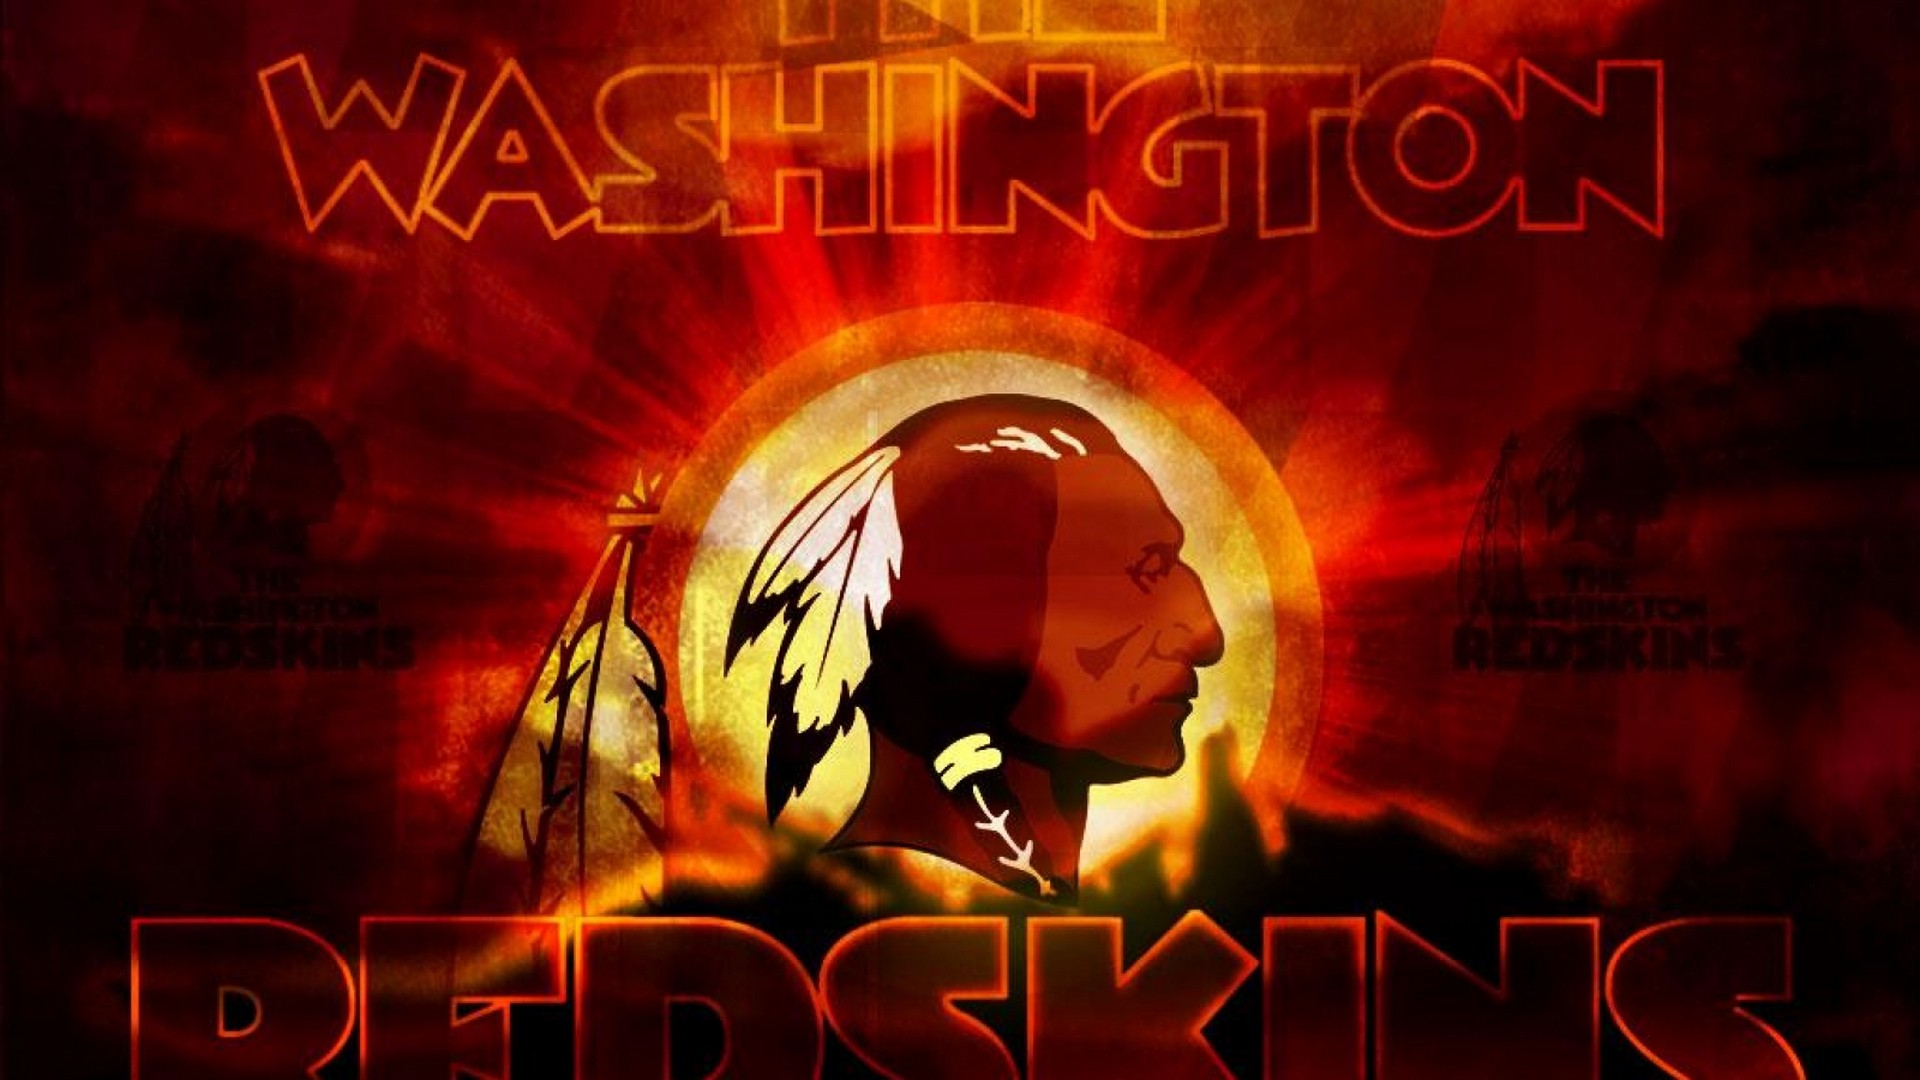 Washington Redskins Desktop Wallpapers 2020 NFL Football Wallpapers 1920x1080